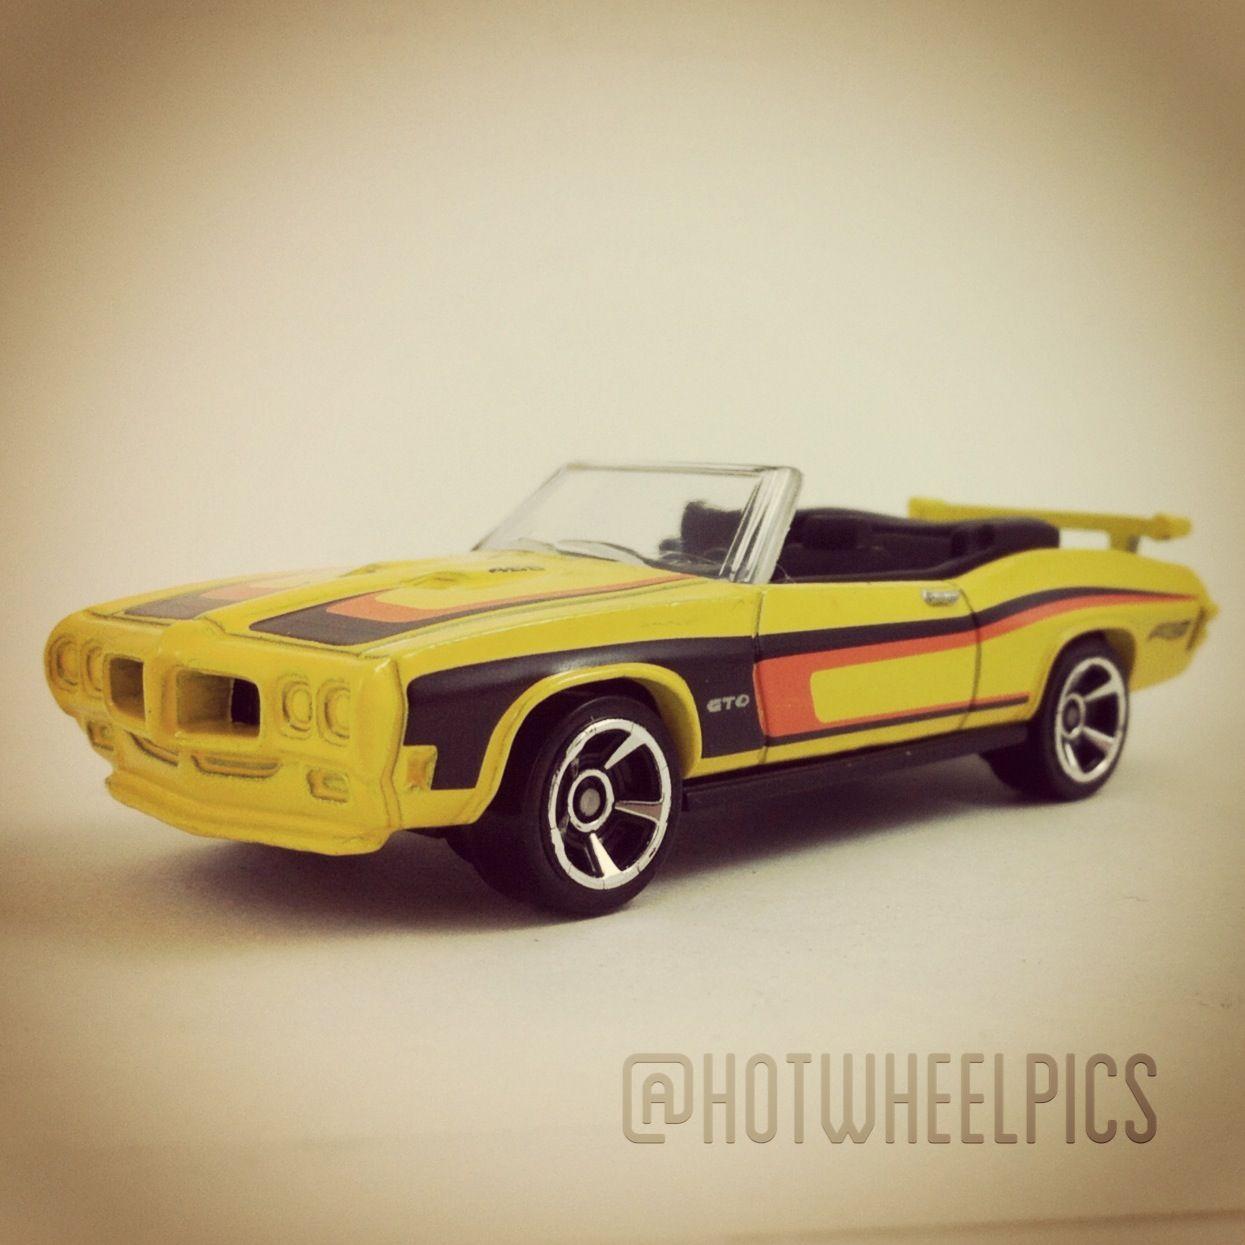 #105 - '70 Pontiac GTO - 2011 Hot Wheels - Muscle Mania